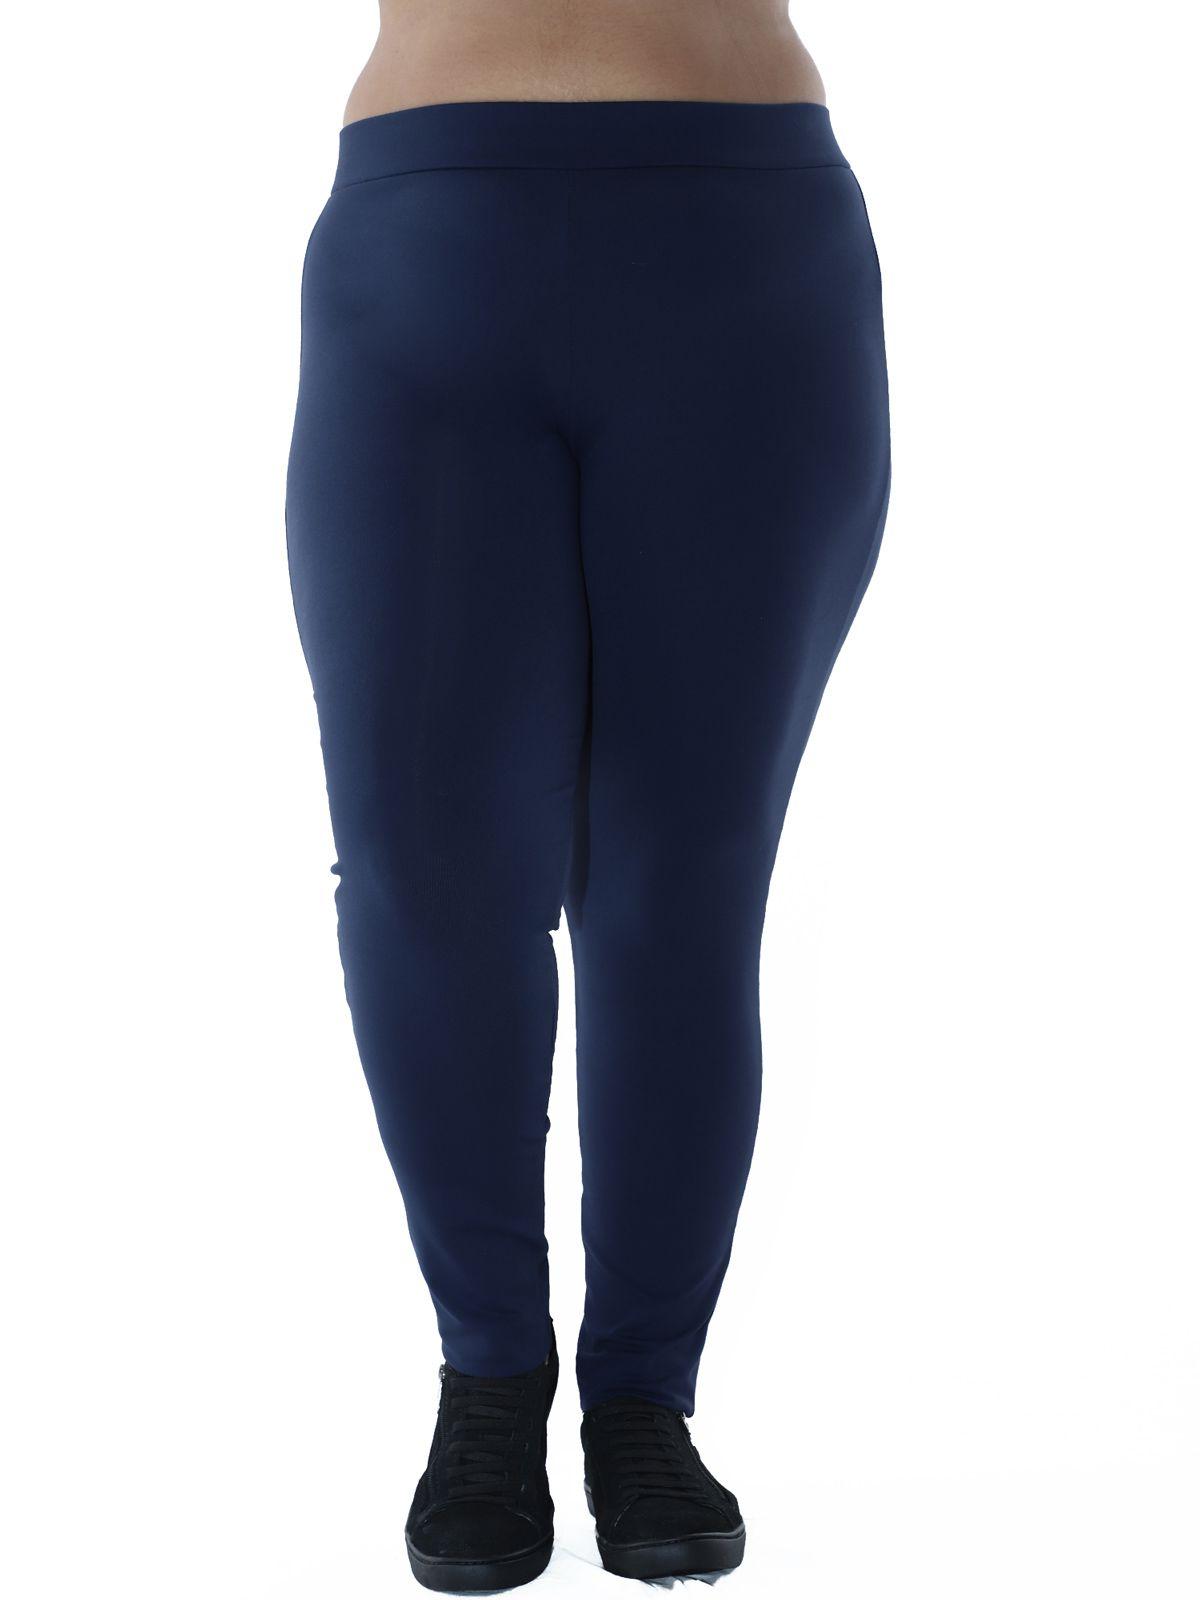 Calça Legging Plus Size Fitness KTS Marinho